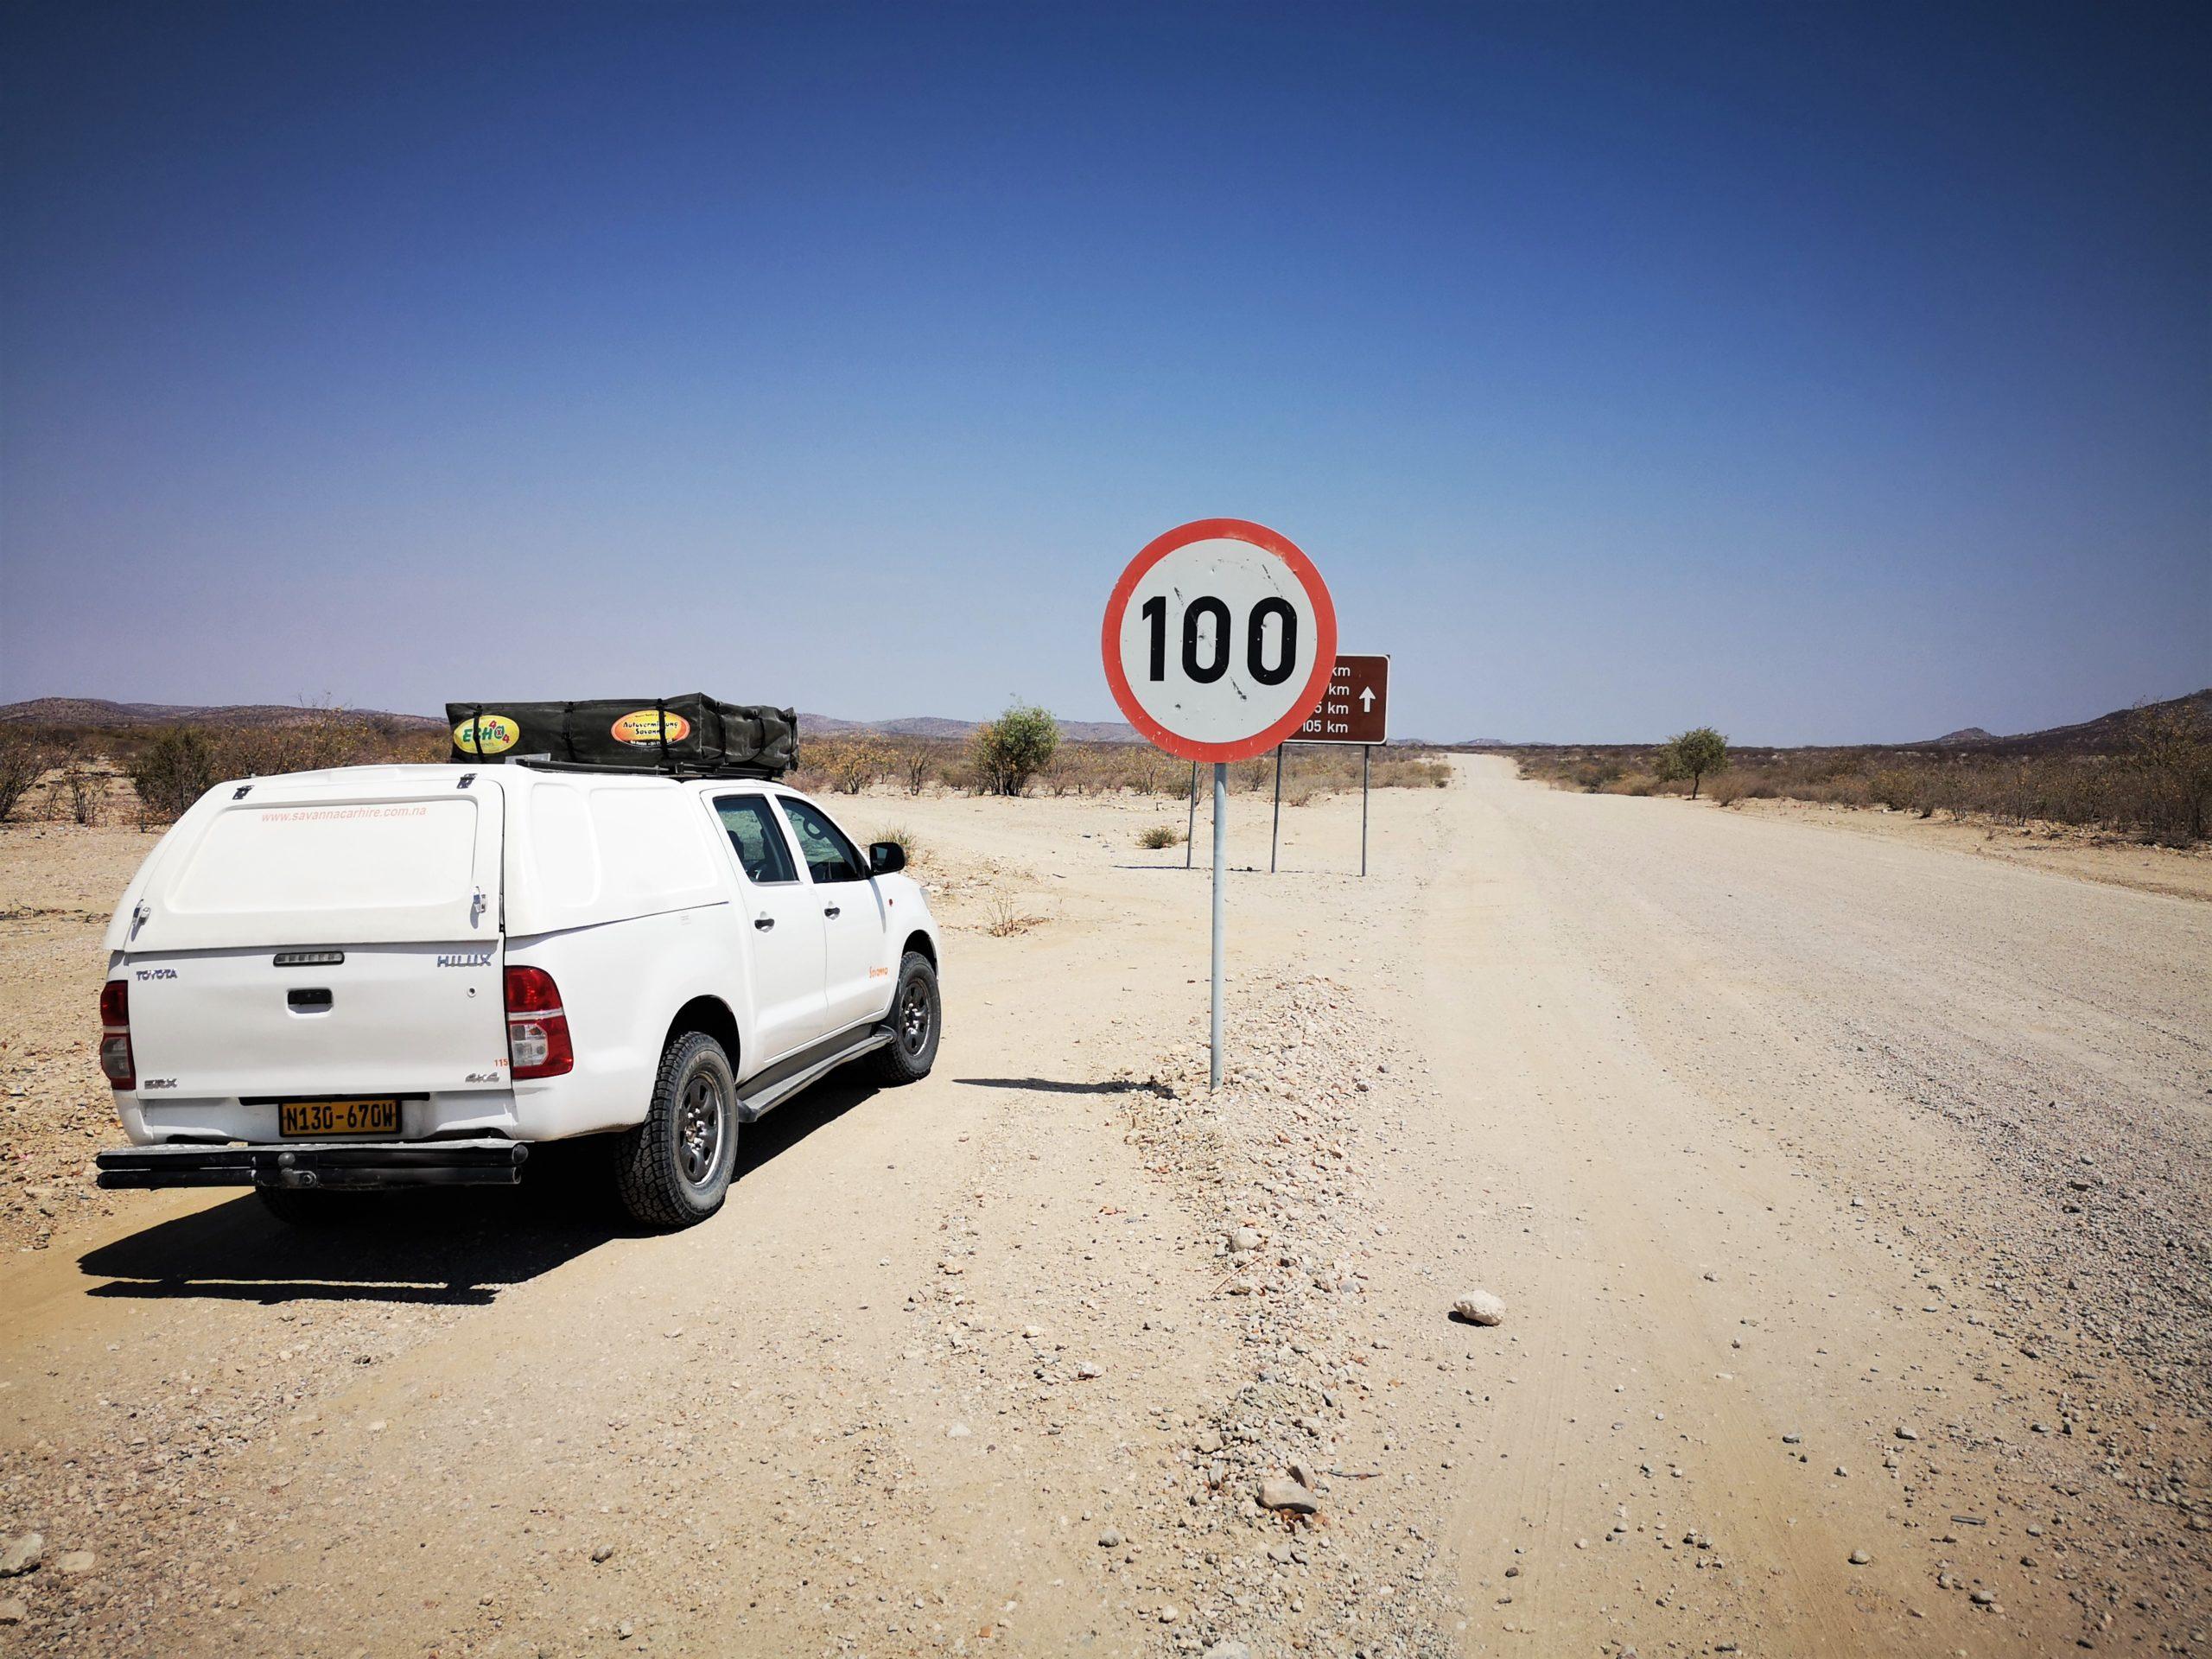 NAMIBIA Road Trip Itinerary